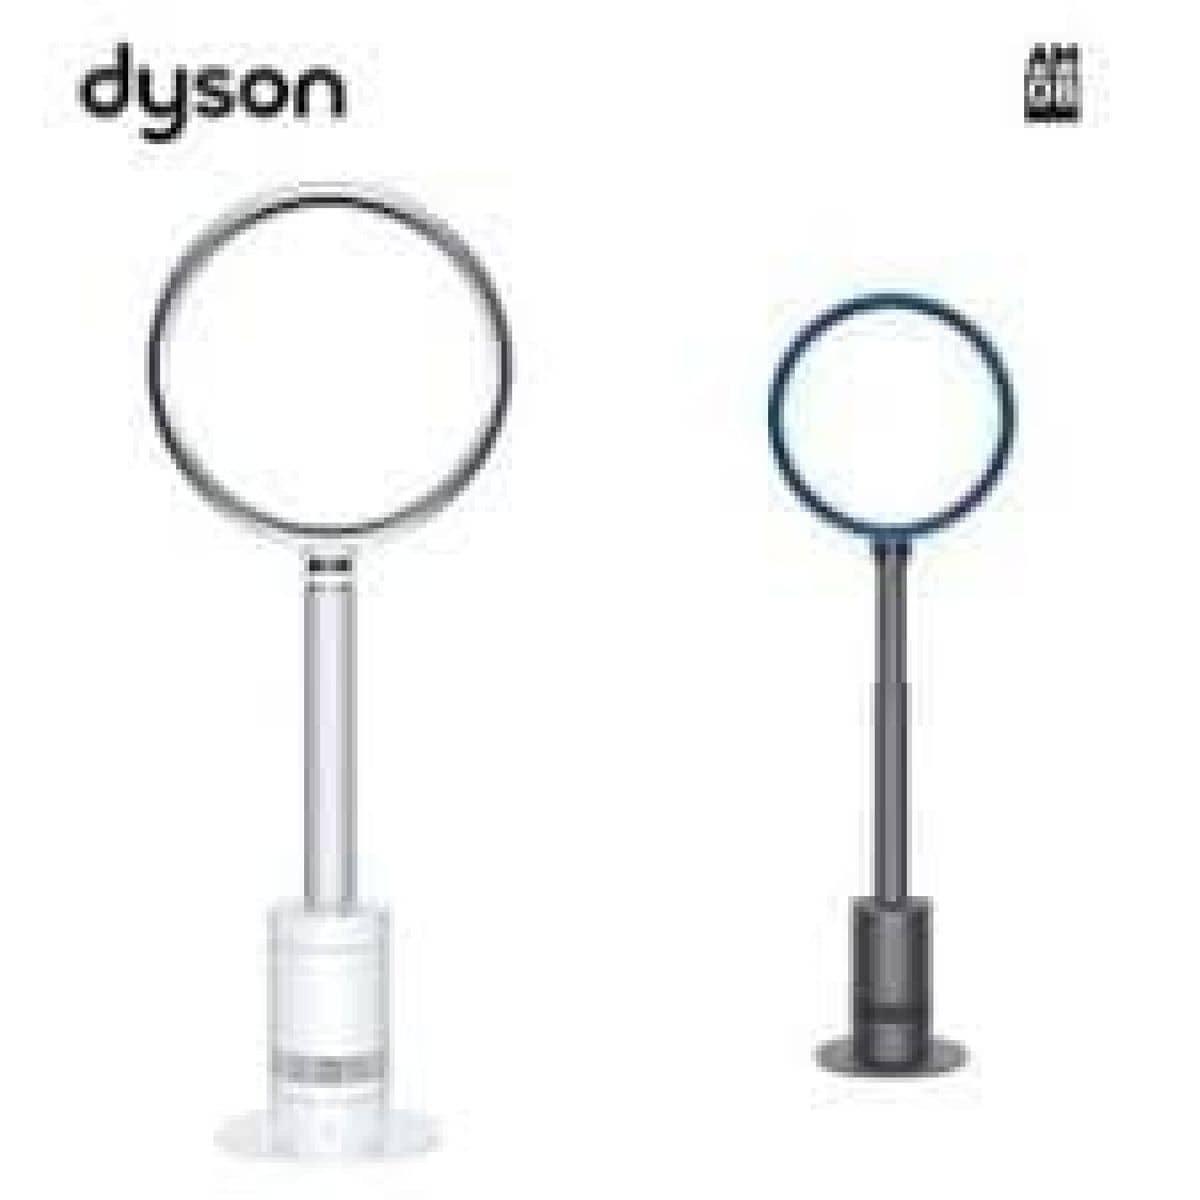 pedestal fan sitemap fans white xml farrta appliances dyson large pedestalfan icon